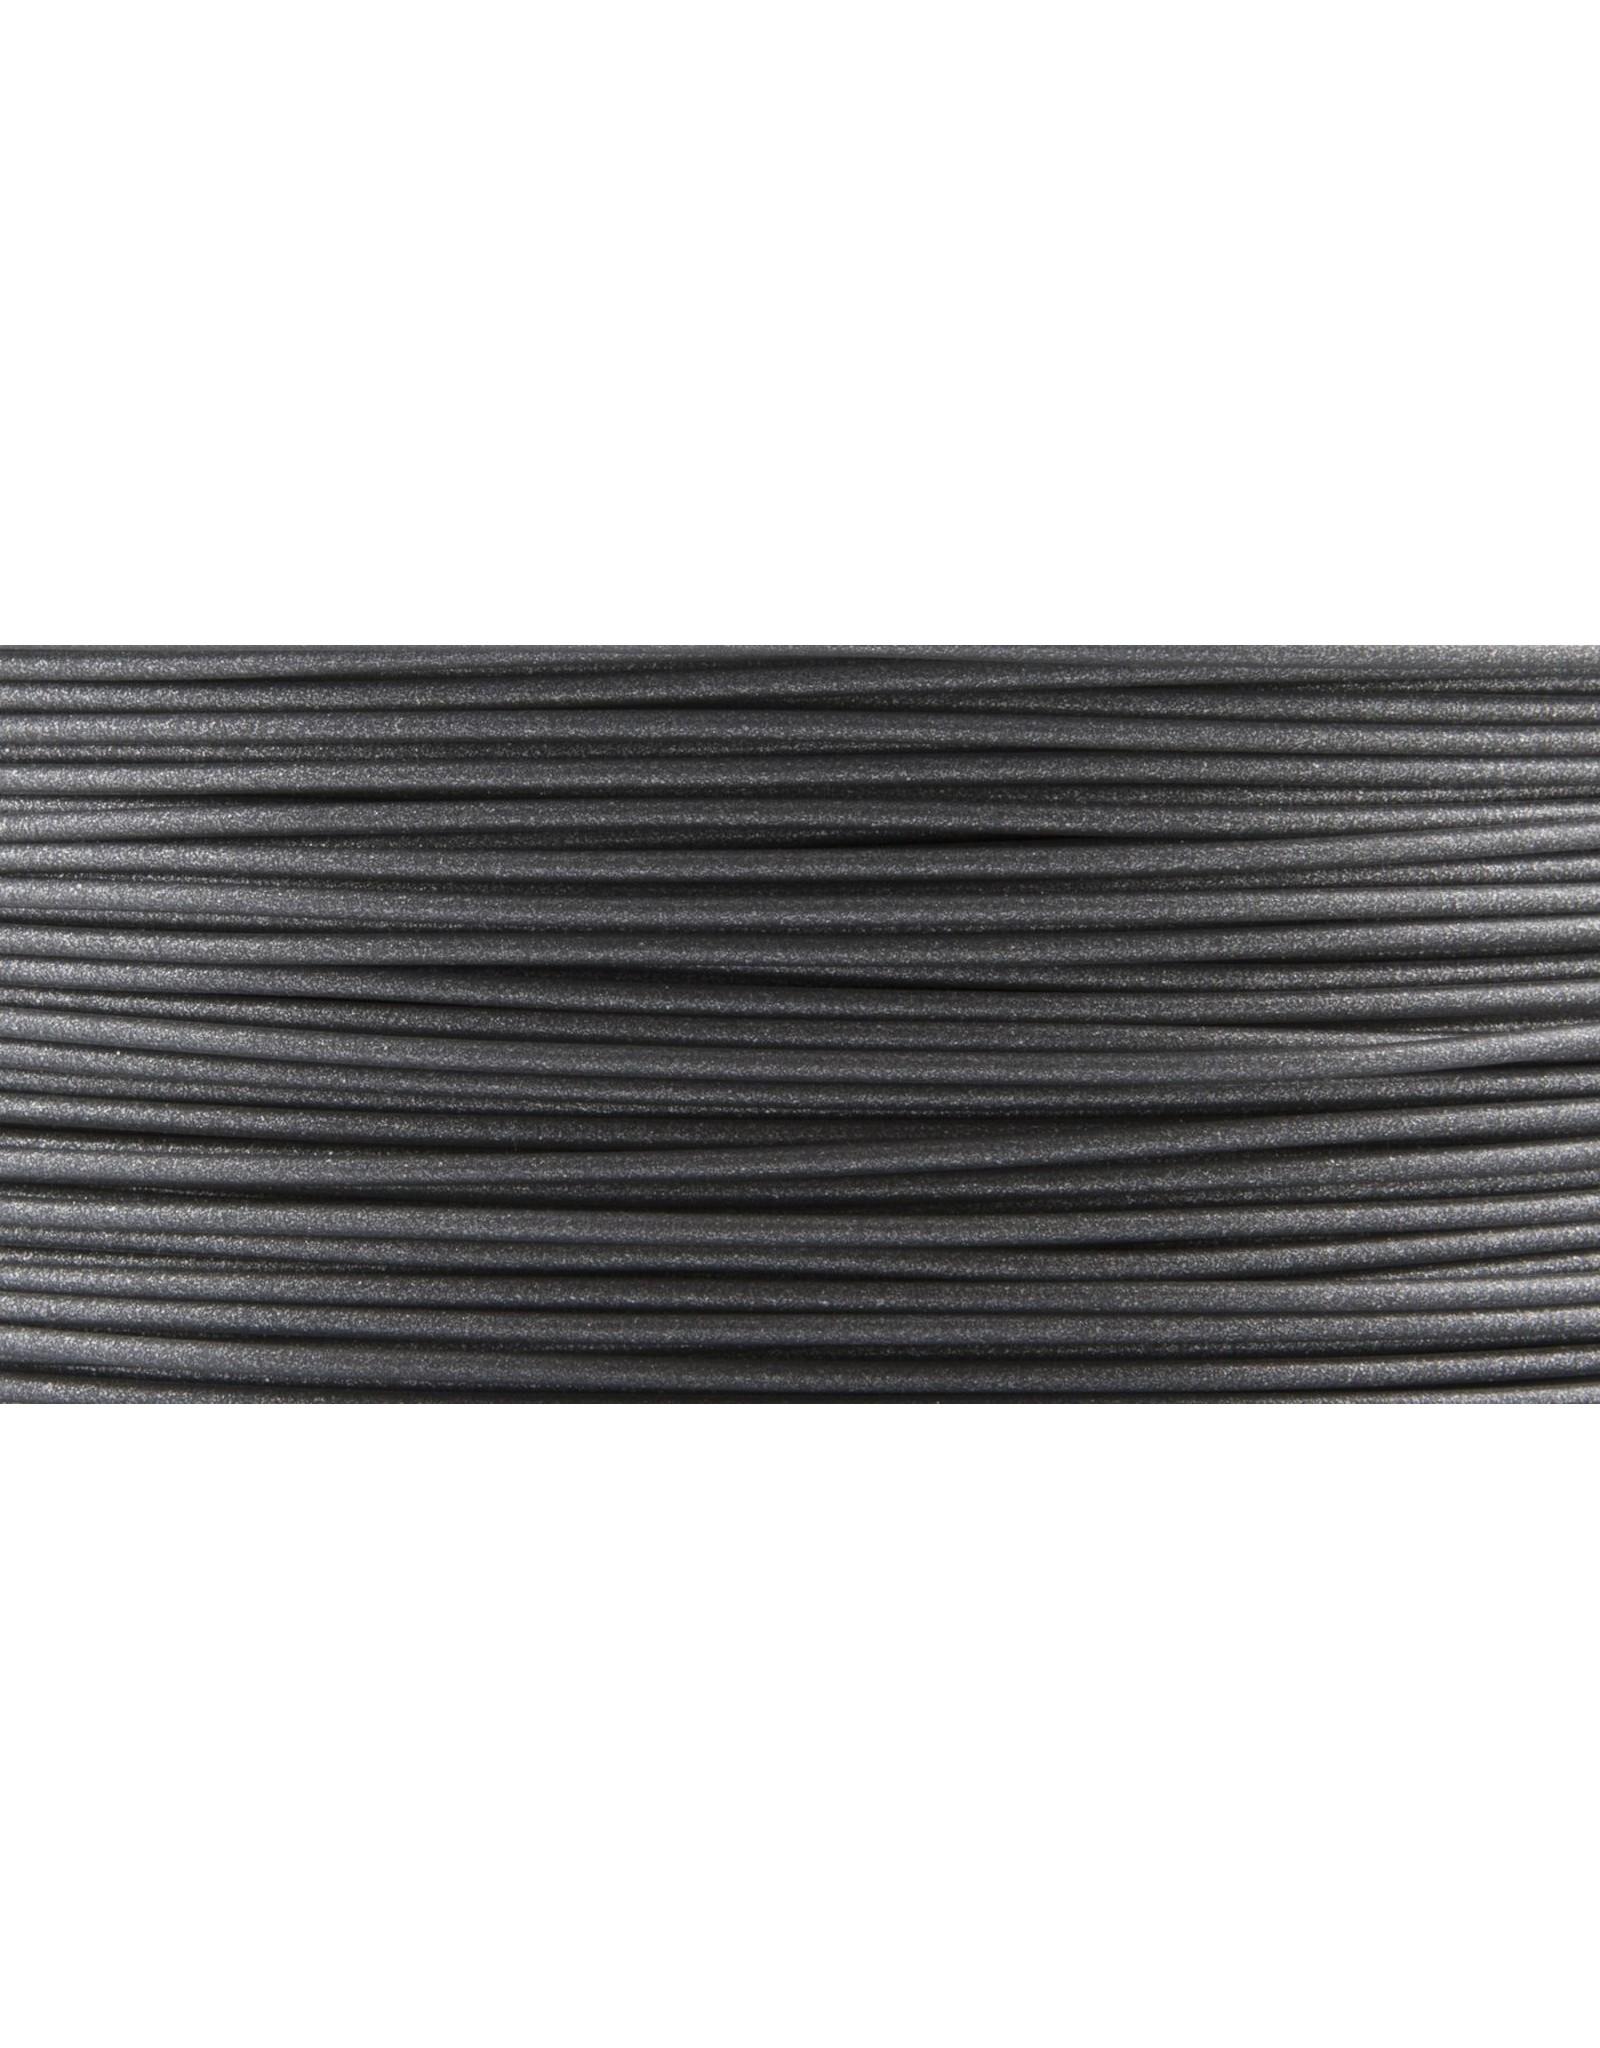 Prima PrimaSelect PLA 1.75mm - 750gr Metallic Silver